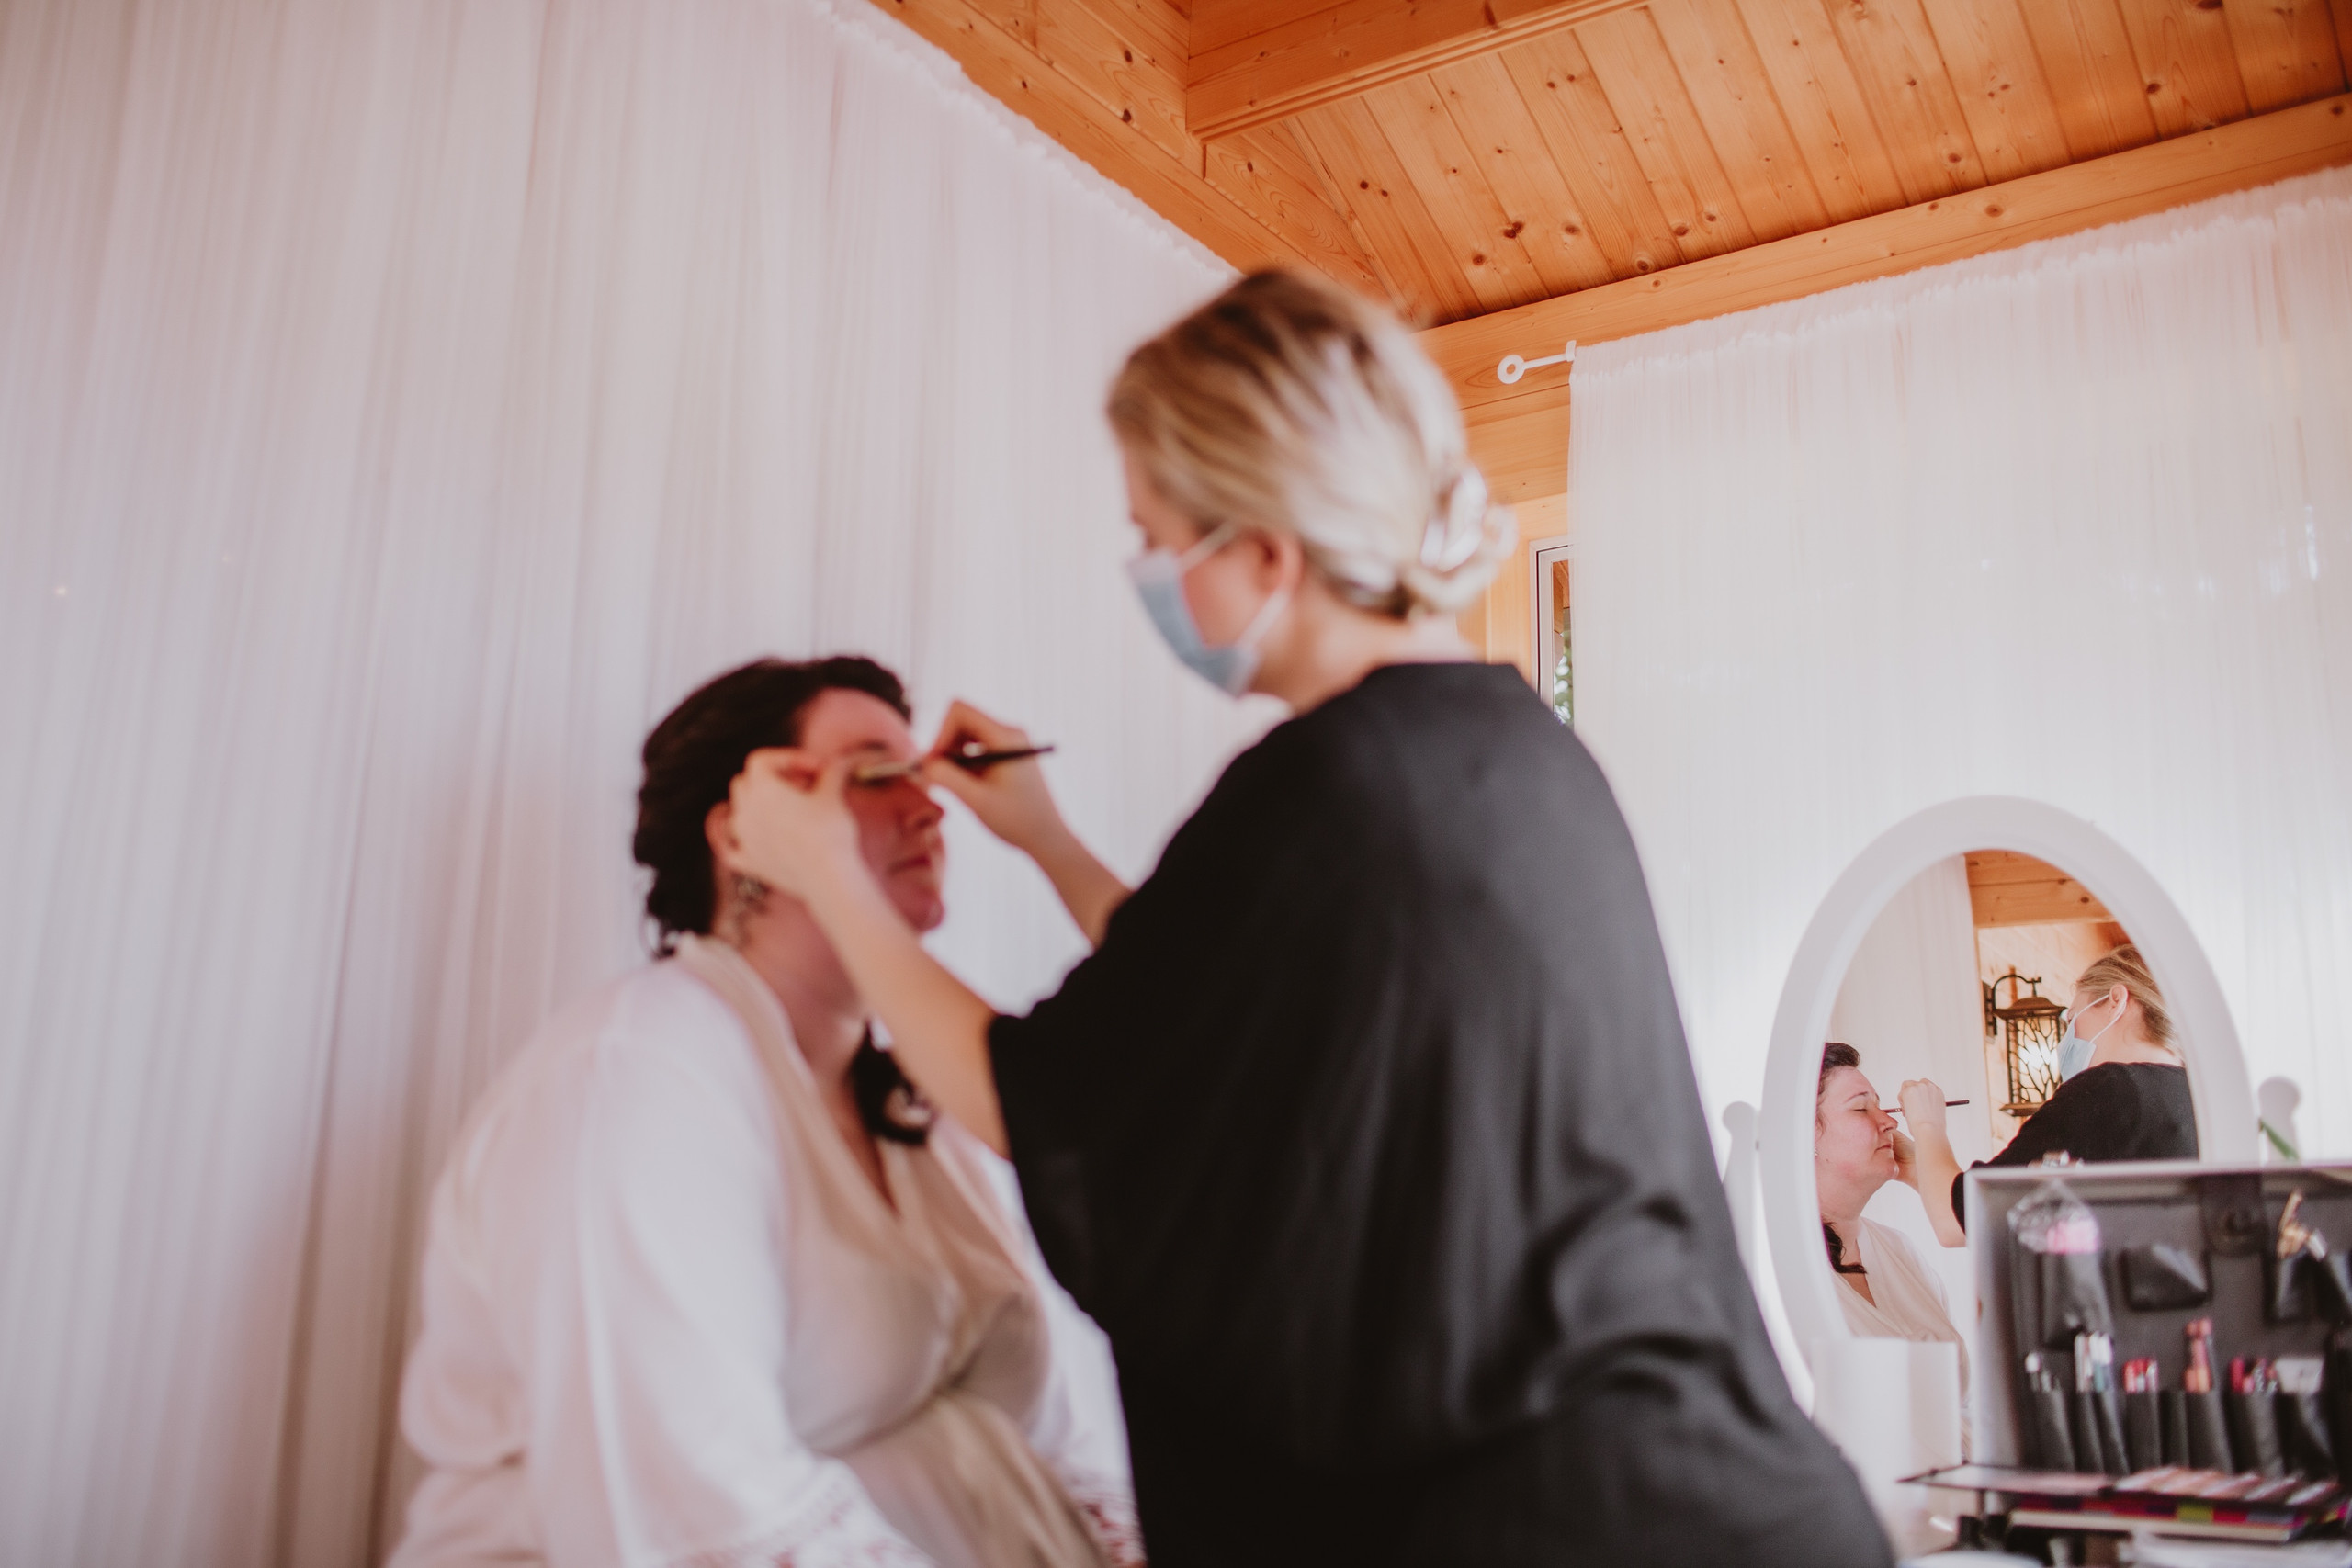 Bridal Makeup - Jessica Kmiec Artistry create a bridal look for Manitoba fall wedding.